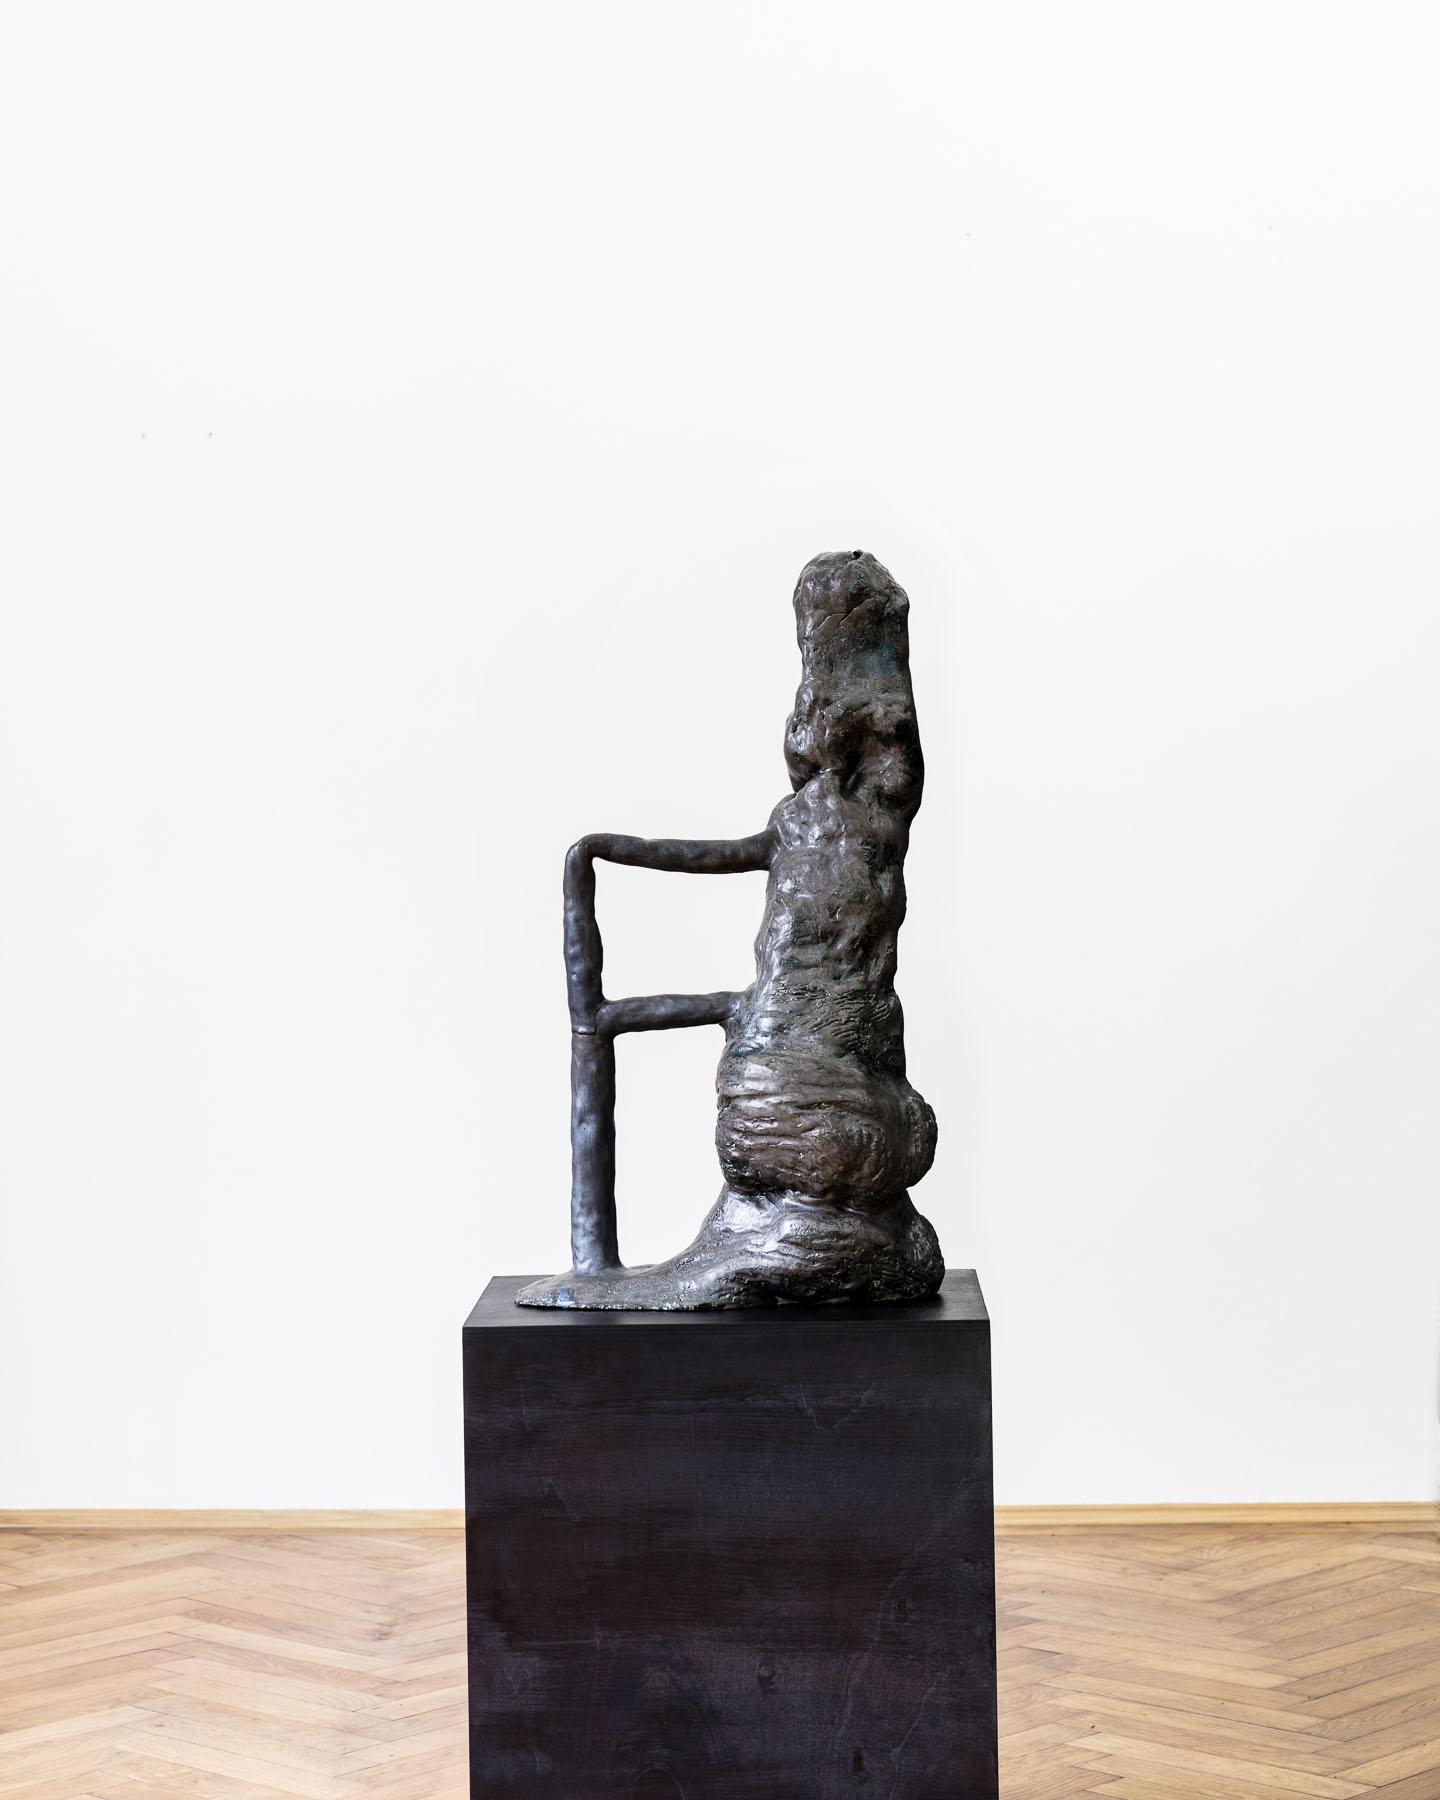 Veronika Hilger, untitled, 2017, ceramic, glazed, 79 cm x 45 x 27 cm